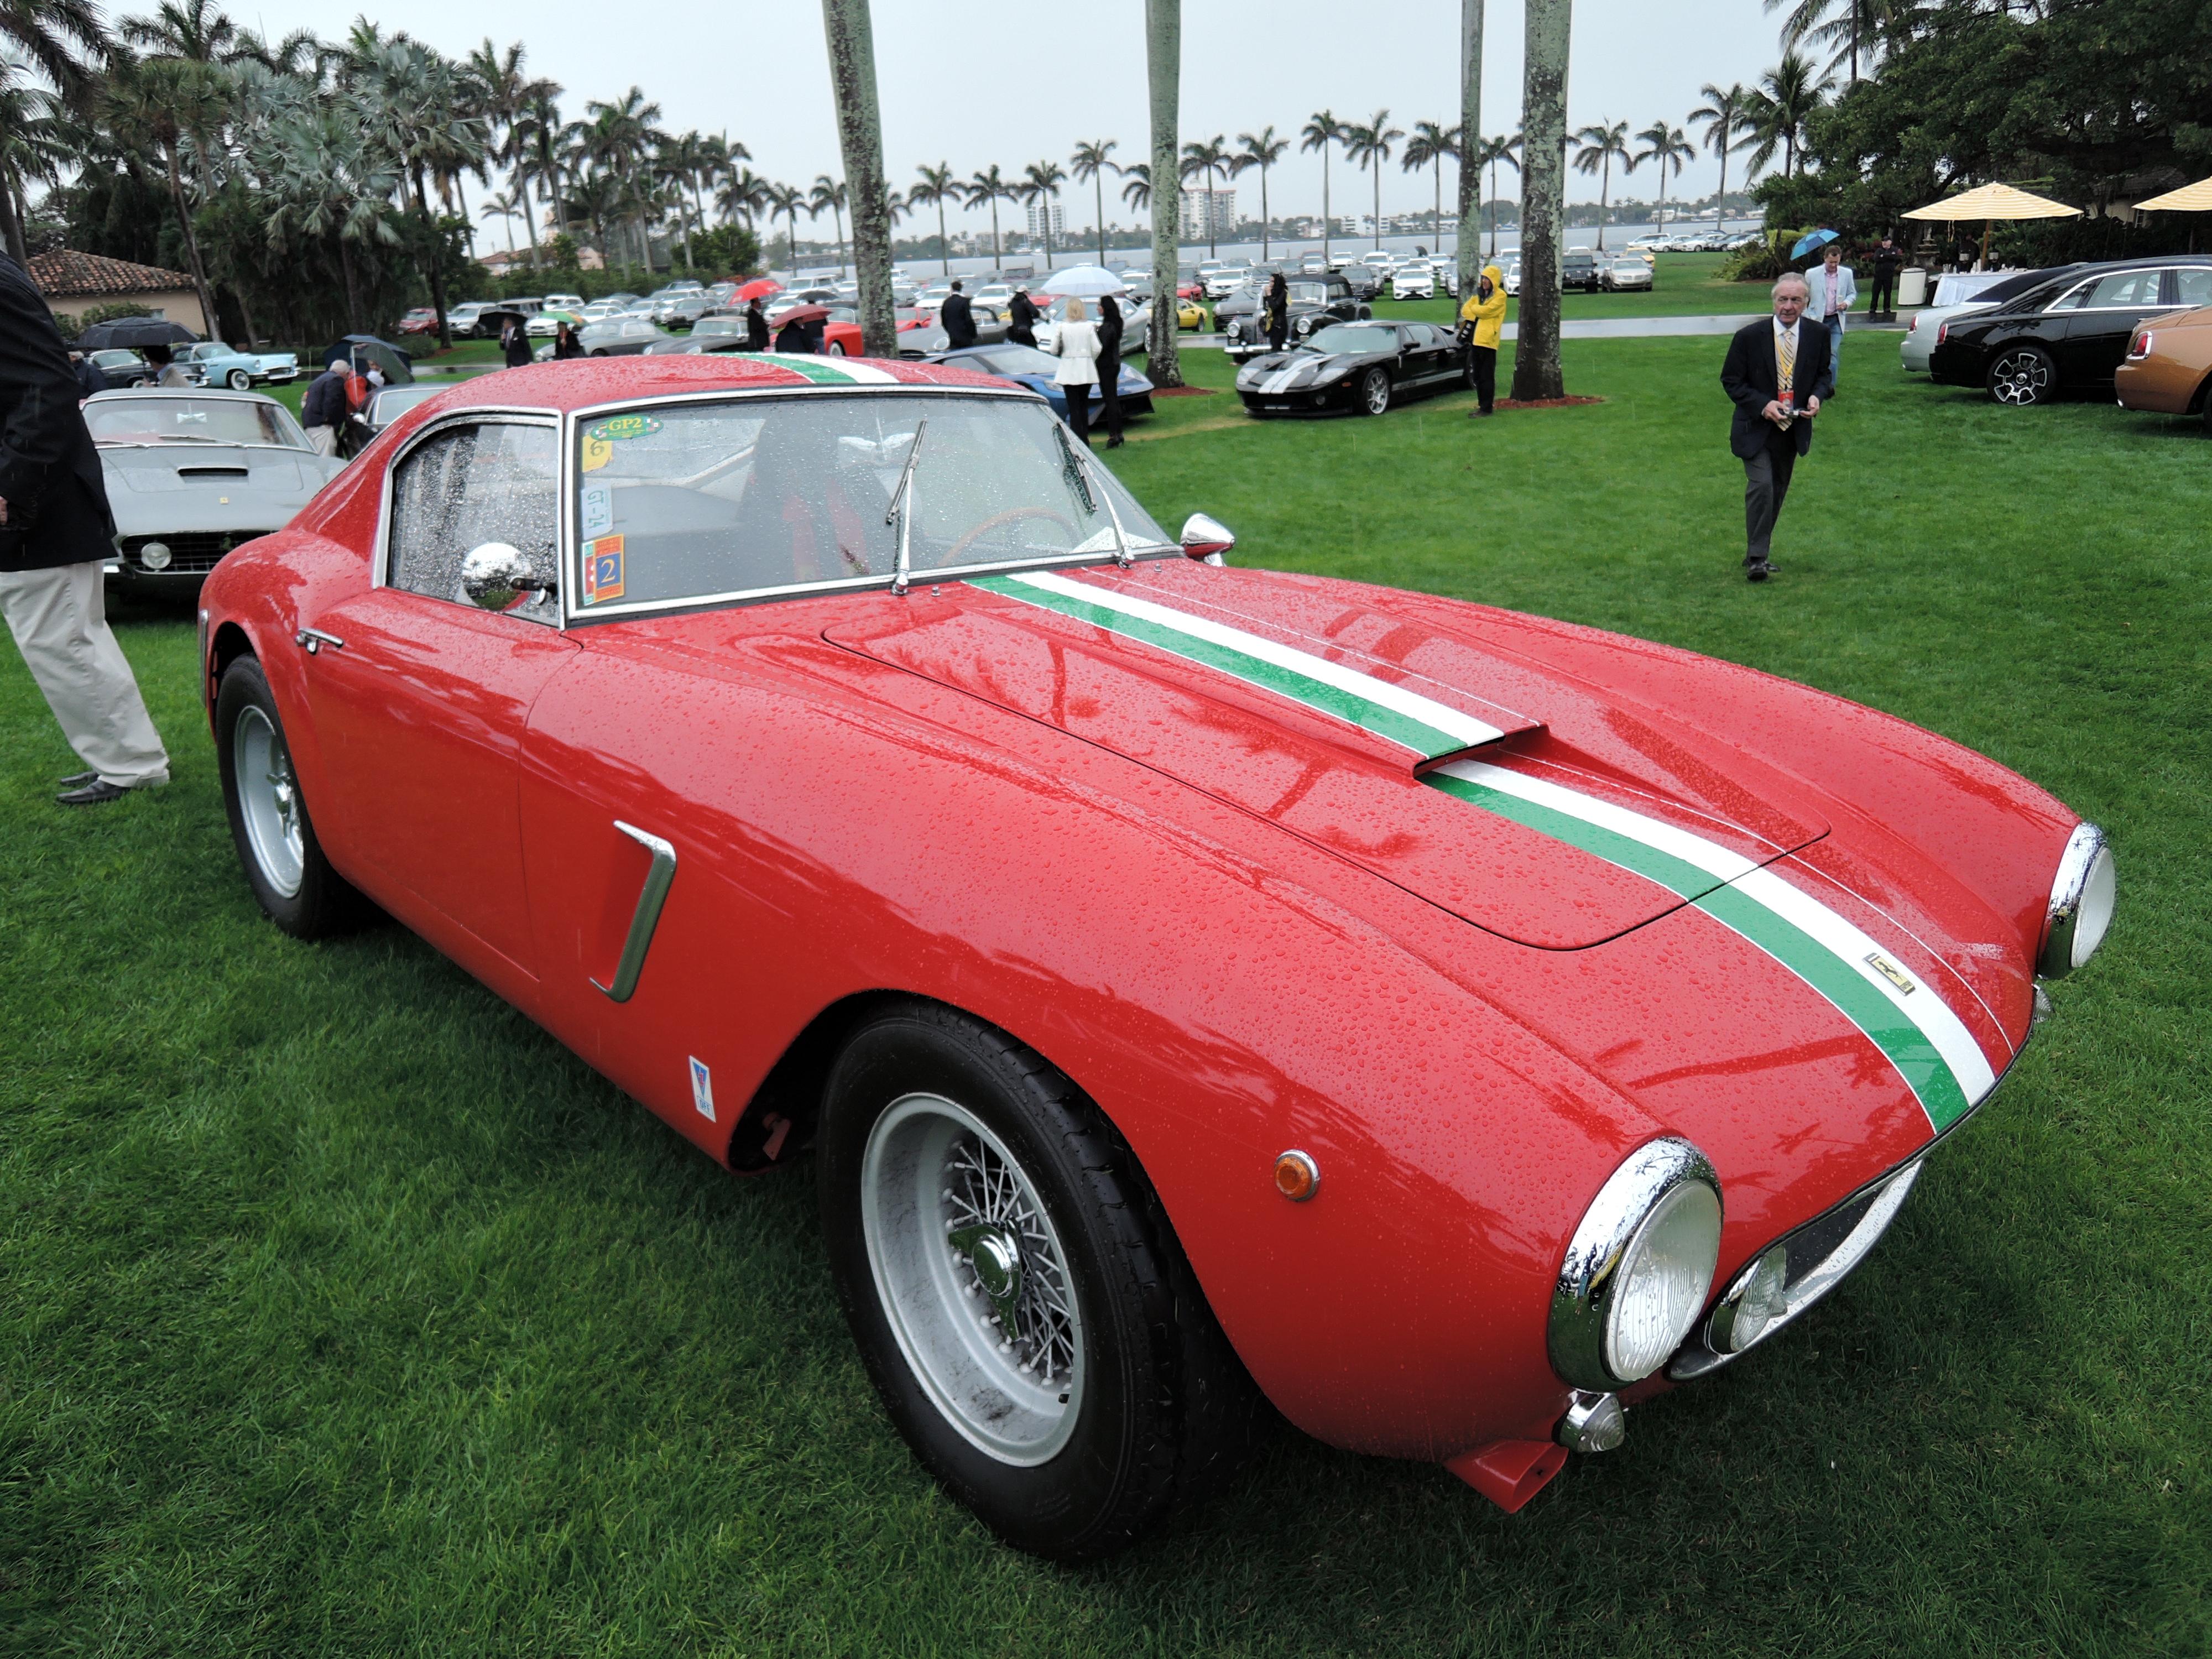 red 1959 Ferrari 250 GT SWB; Sn 2095 - MaraLago 2017